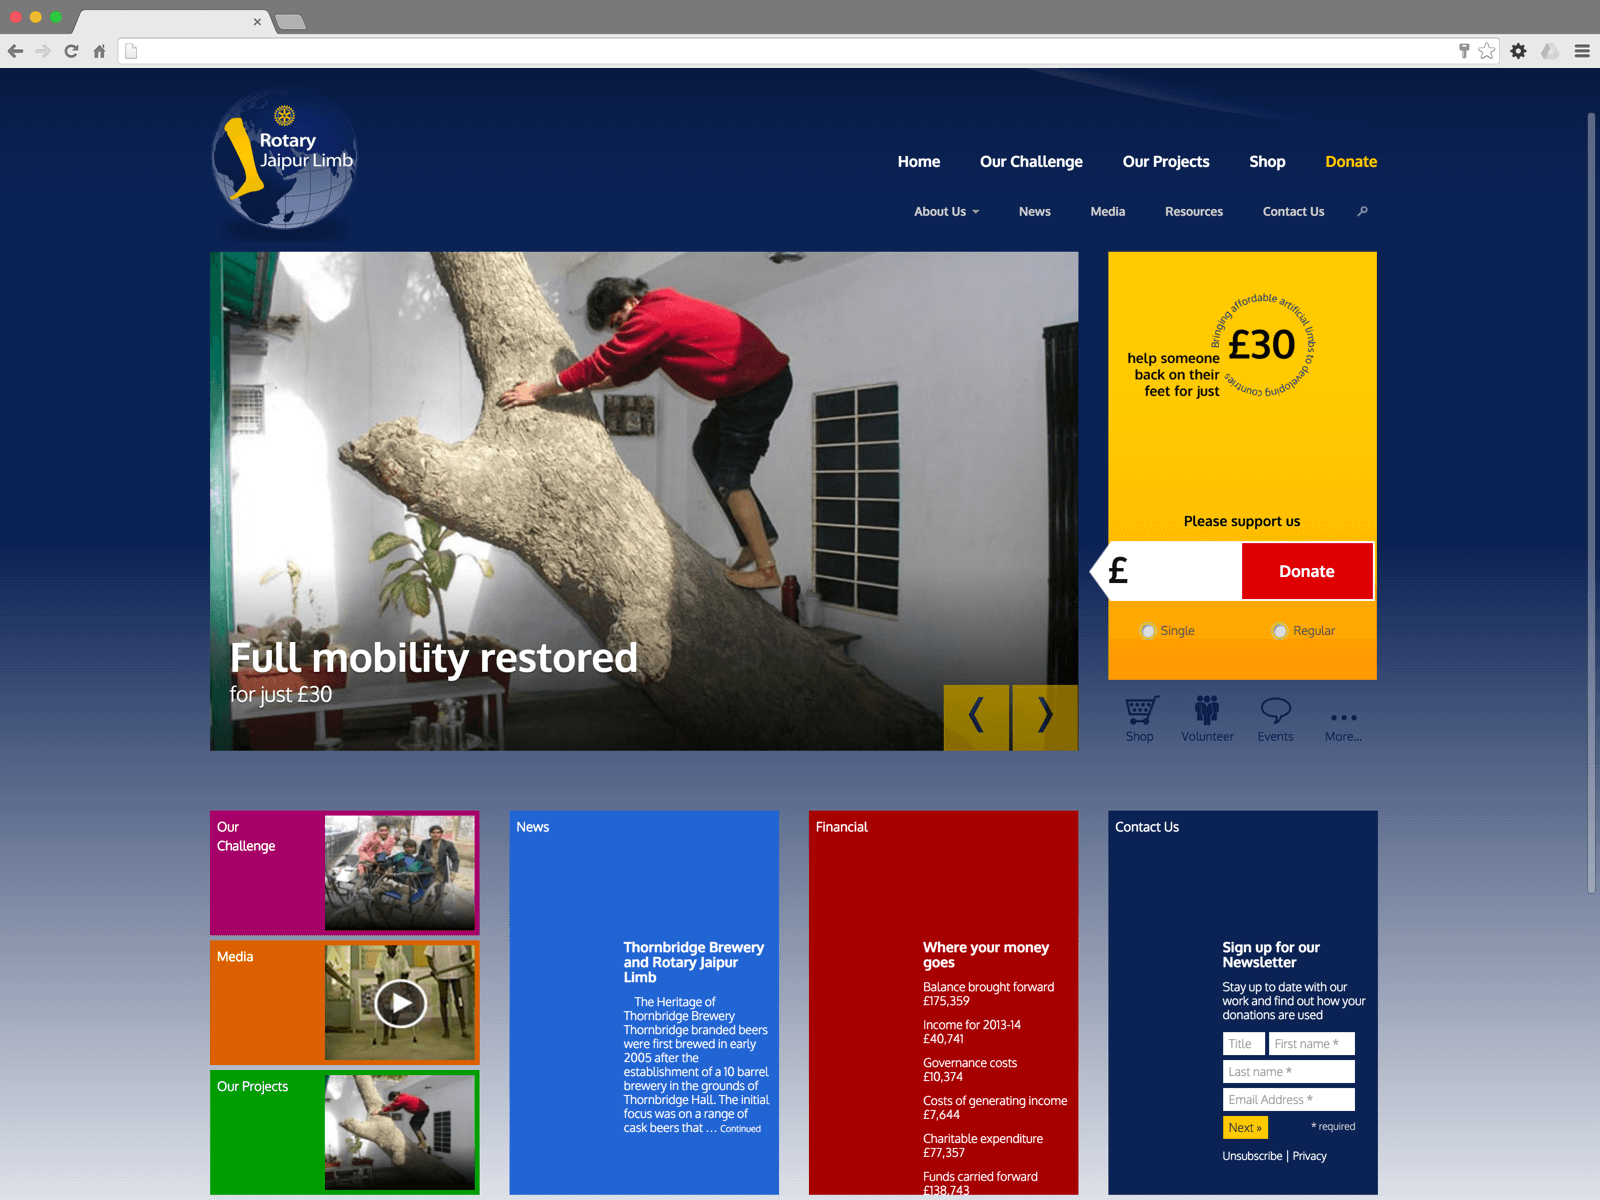 Rotary Jaipur Limb website (Website on desktop)